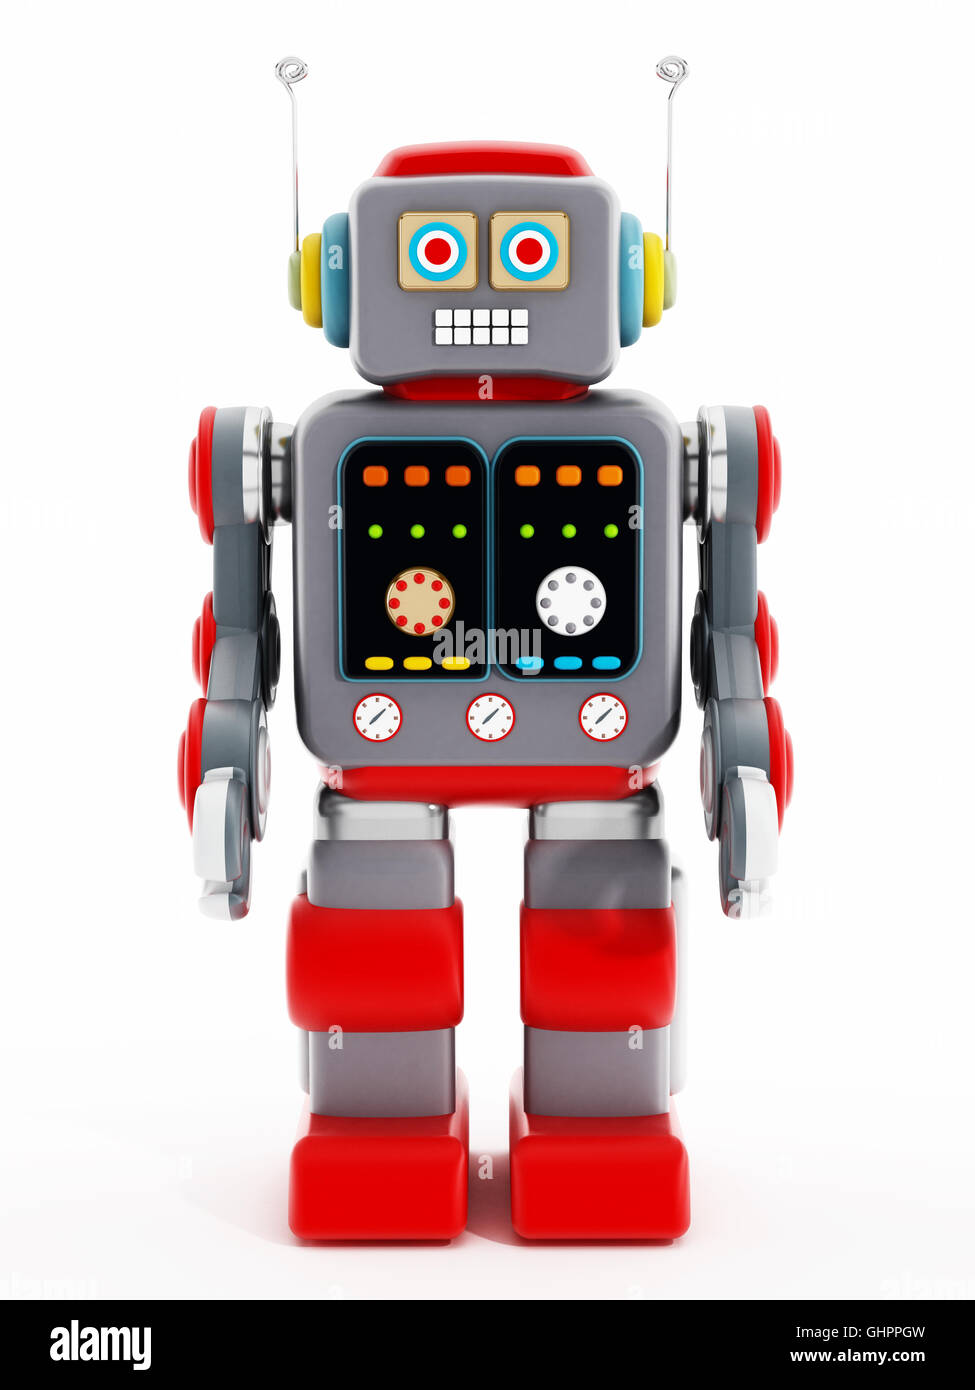 Vintage toy robot isolated on white background. 3D illustration. - Stock Image